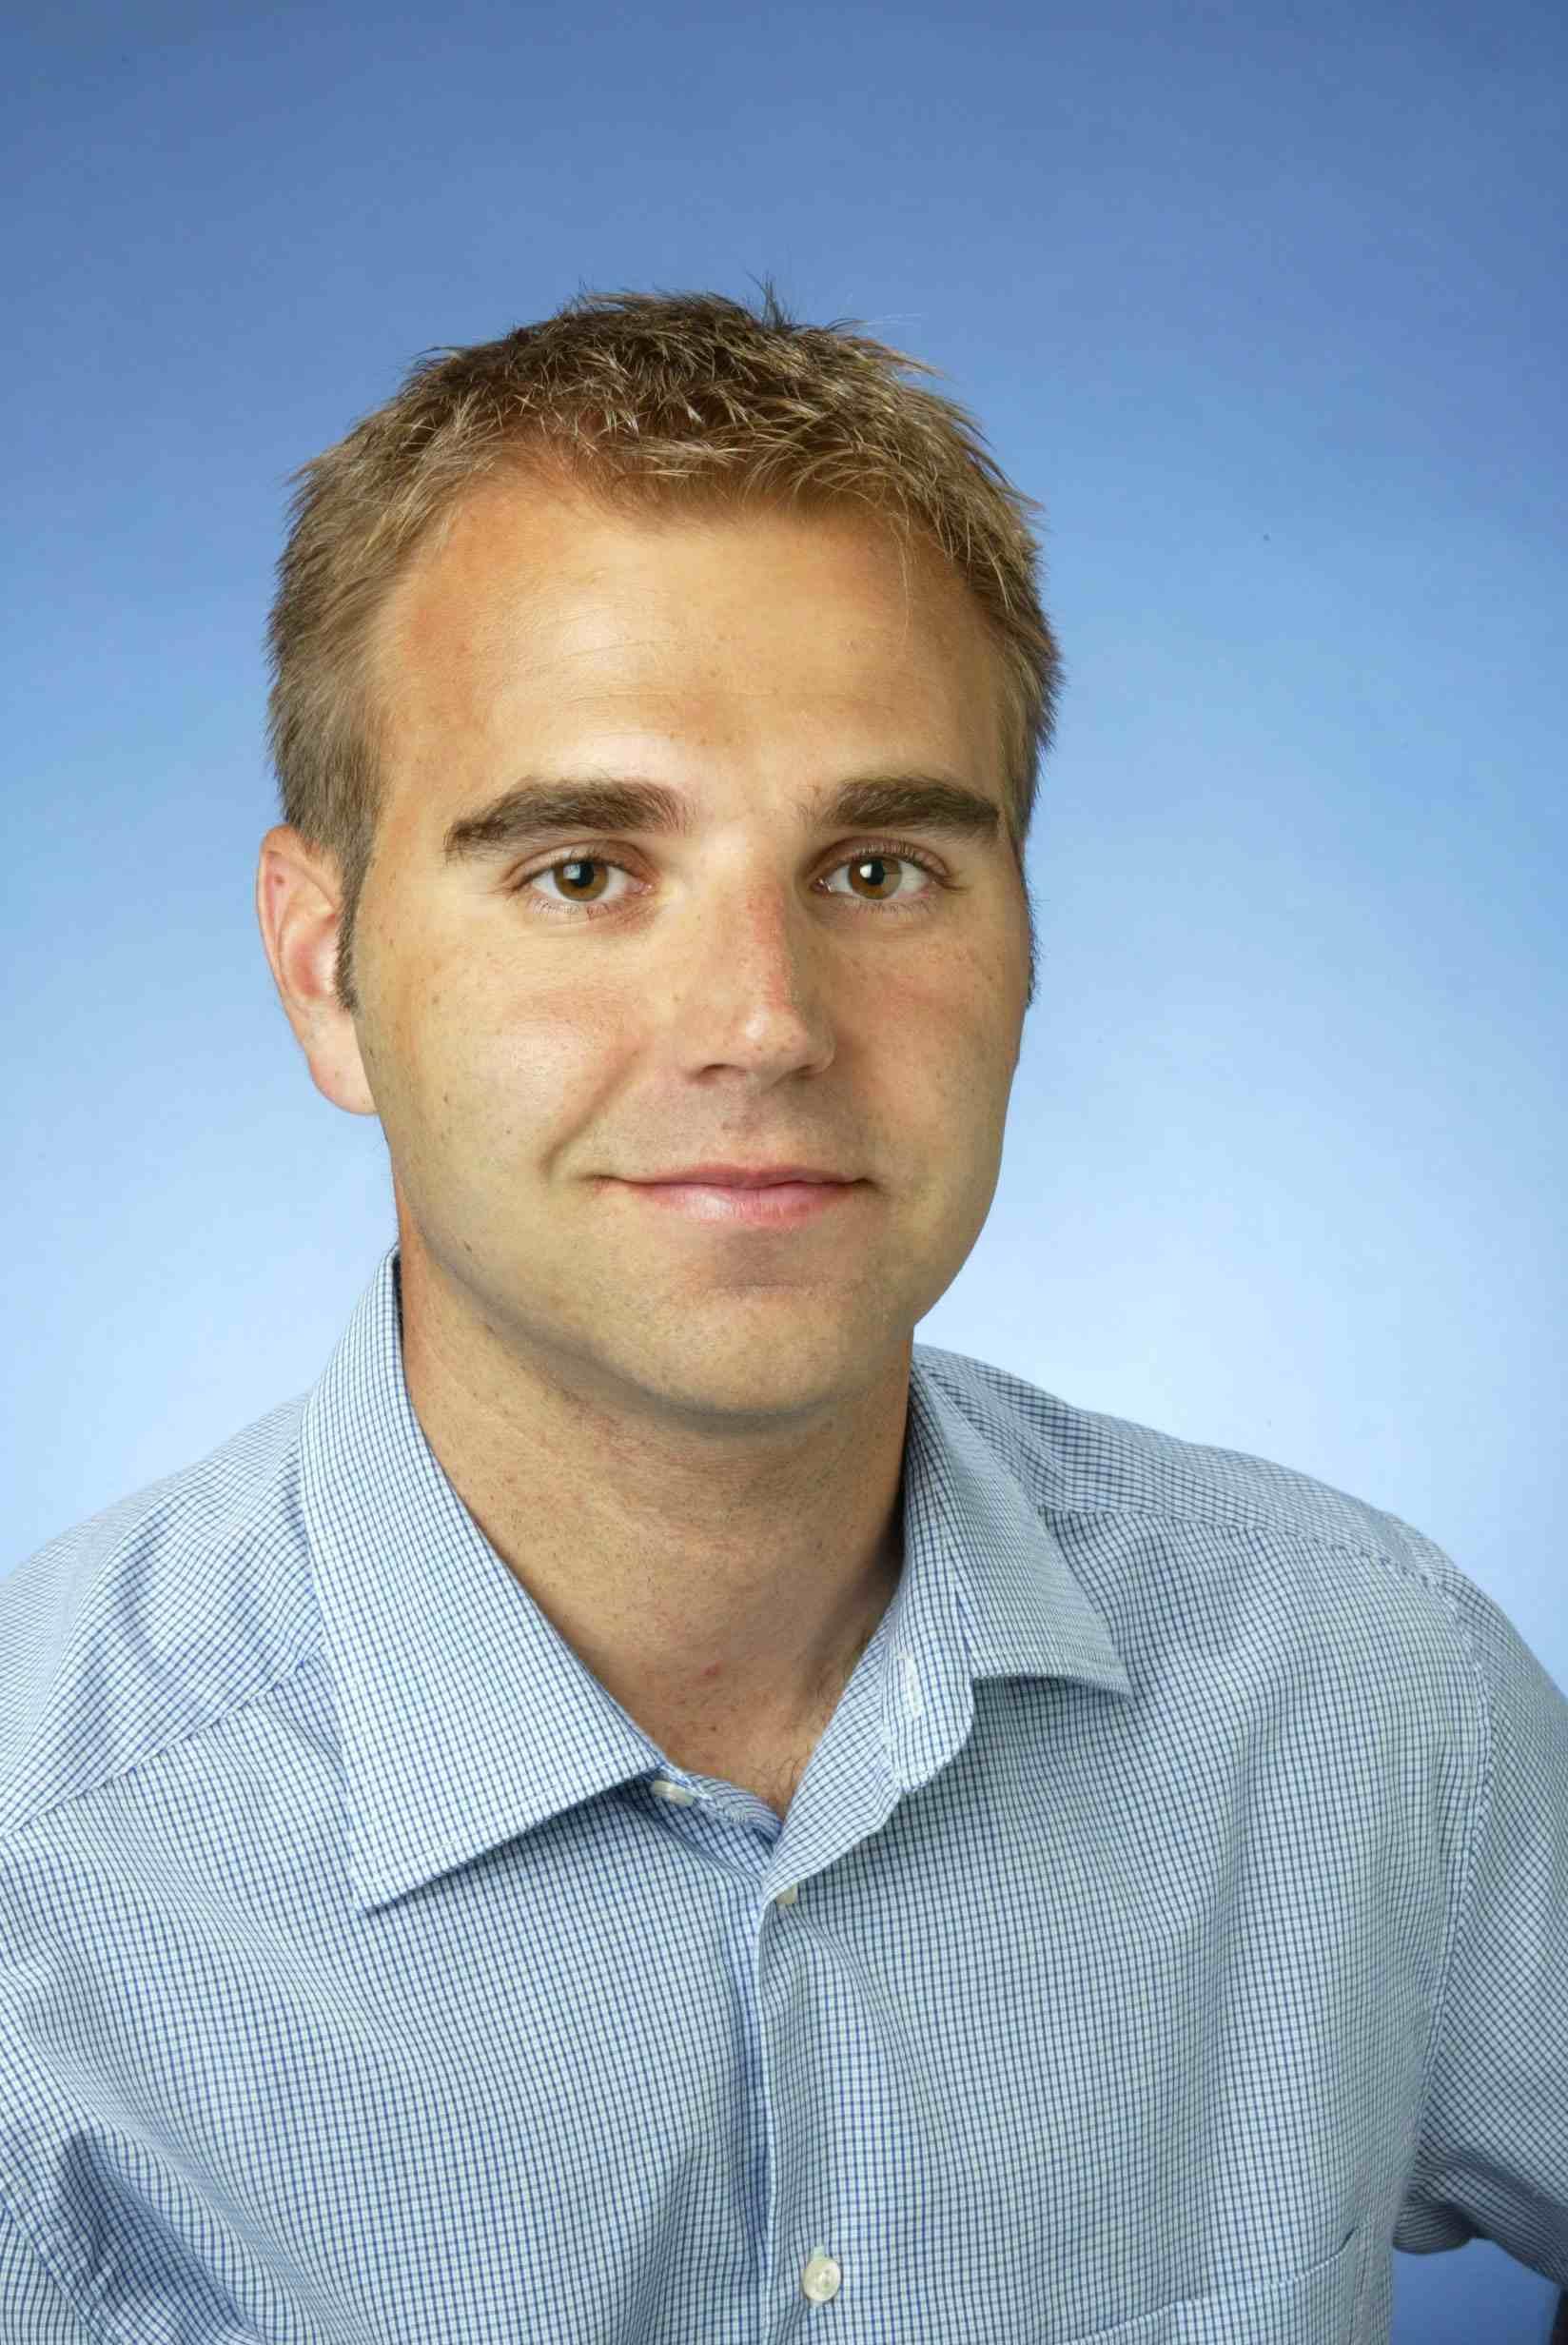 Andreas Luible